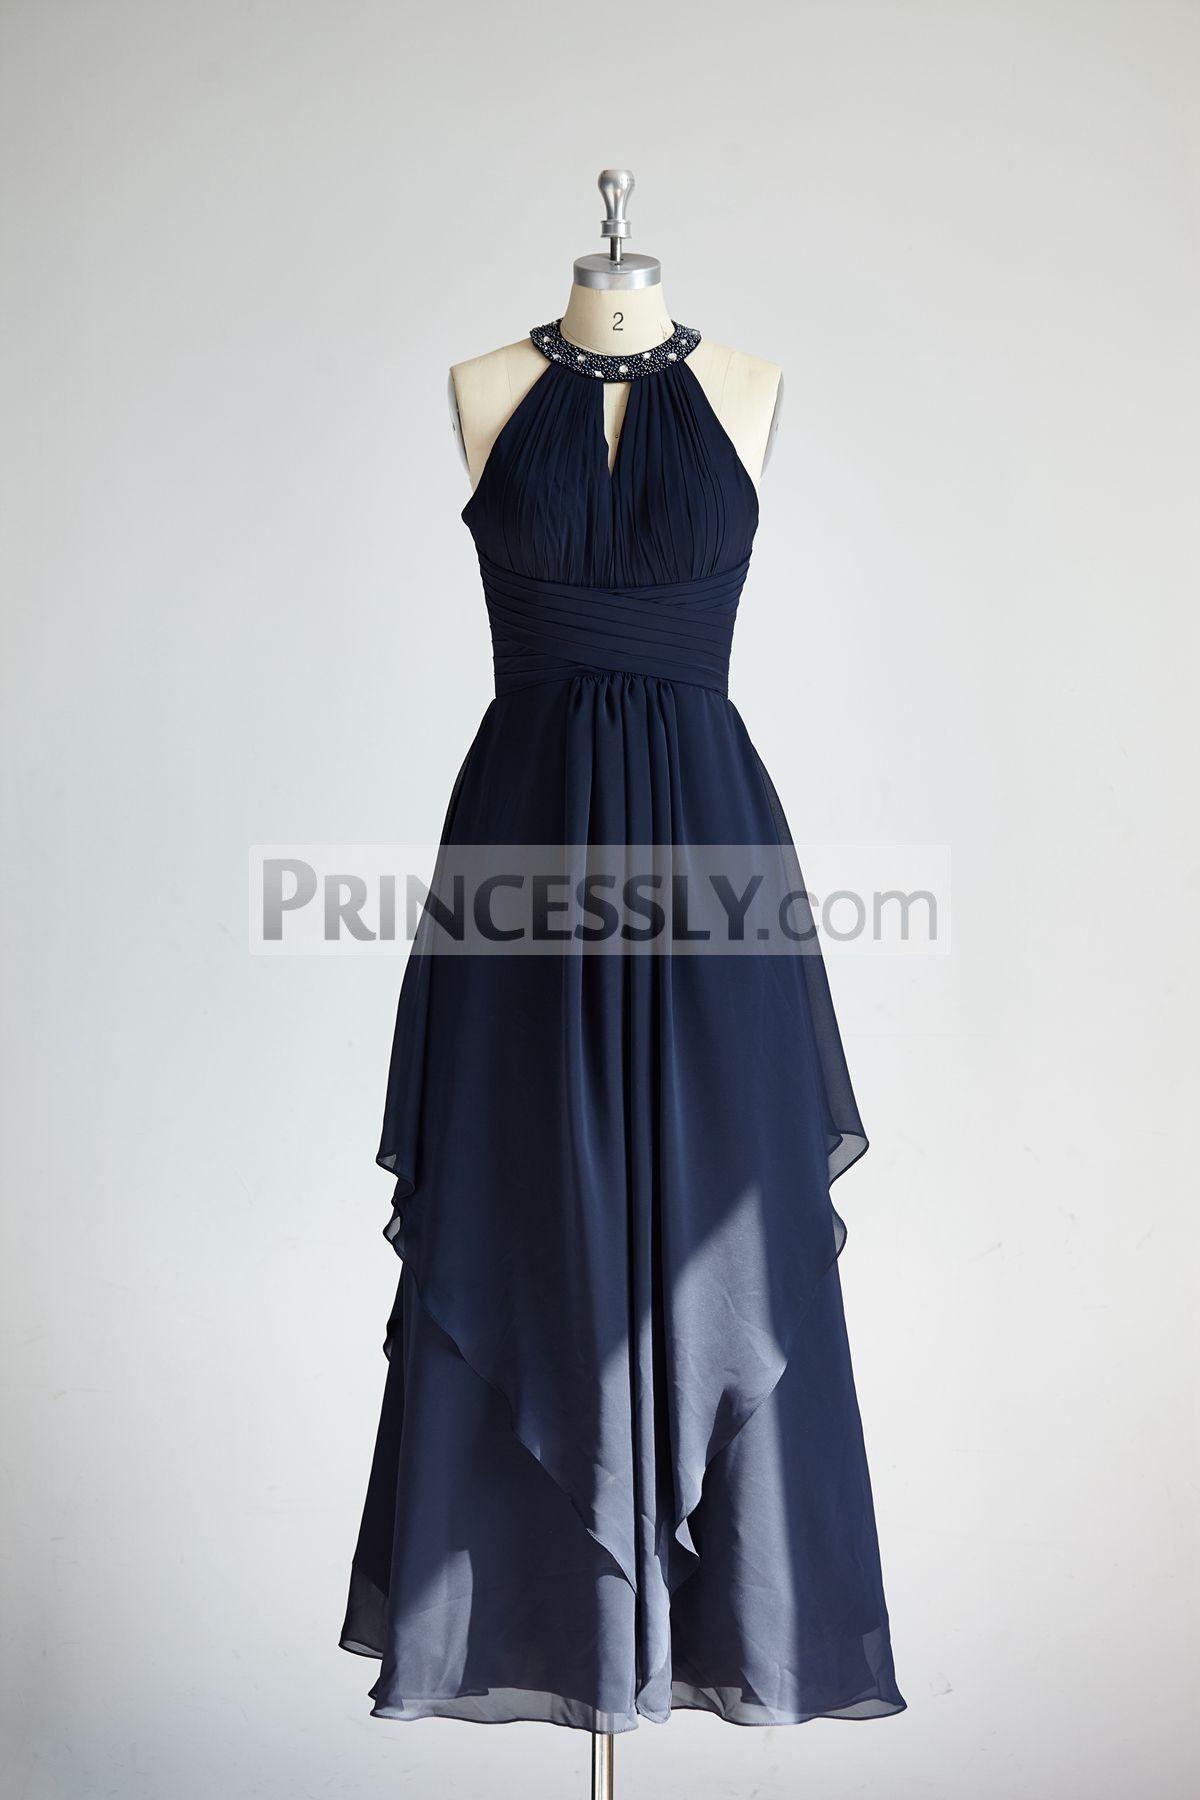 Halter navy blue beaded chiffon long wedding bridesmaid dress in